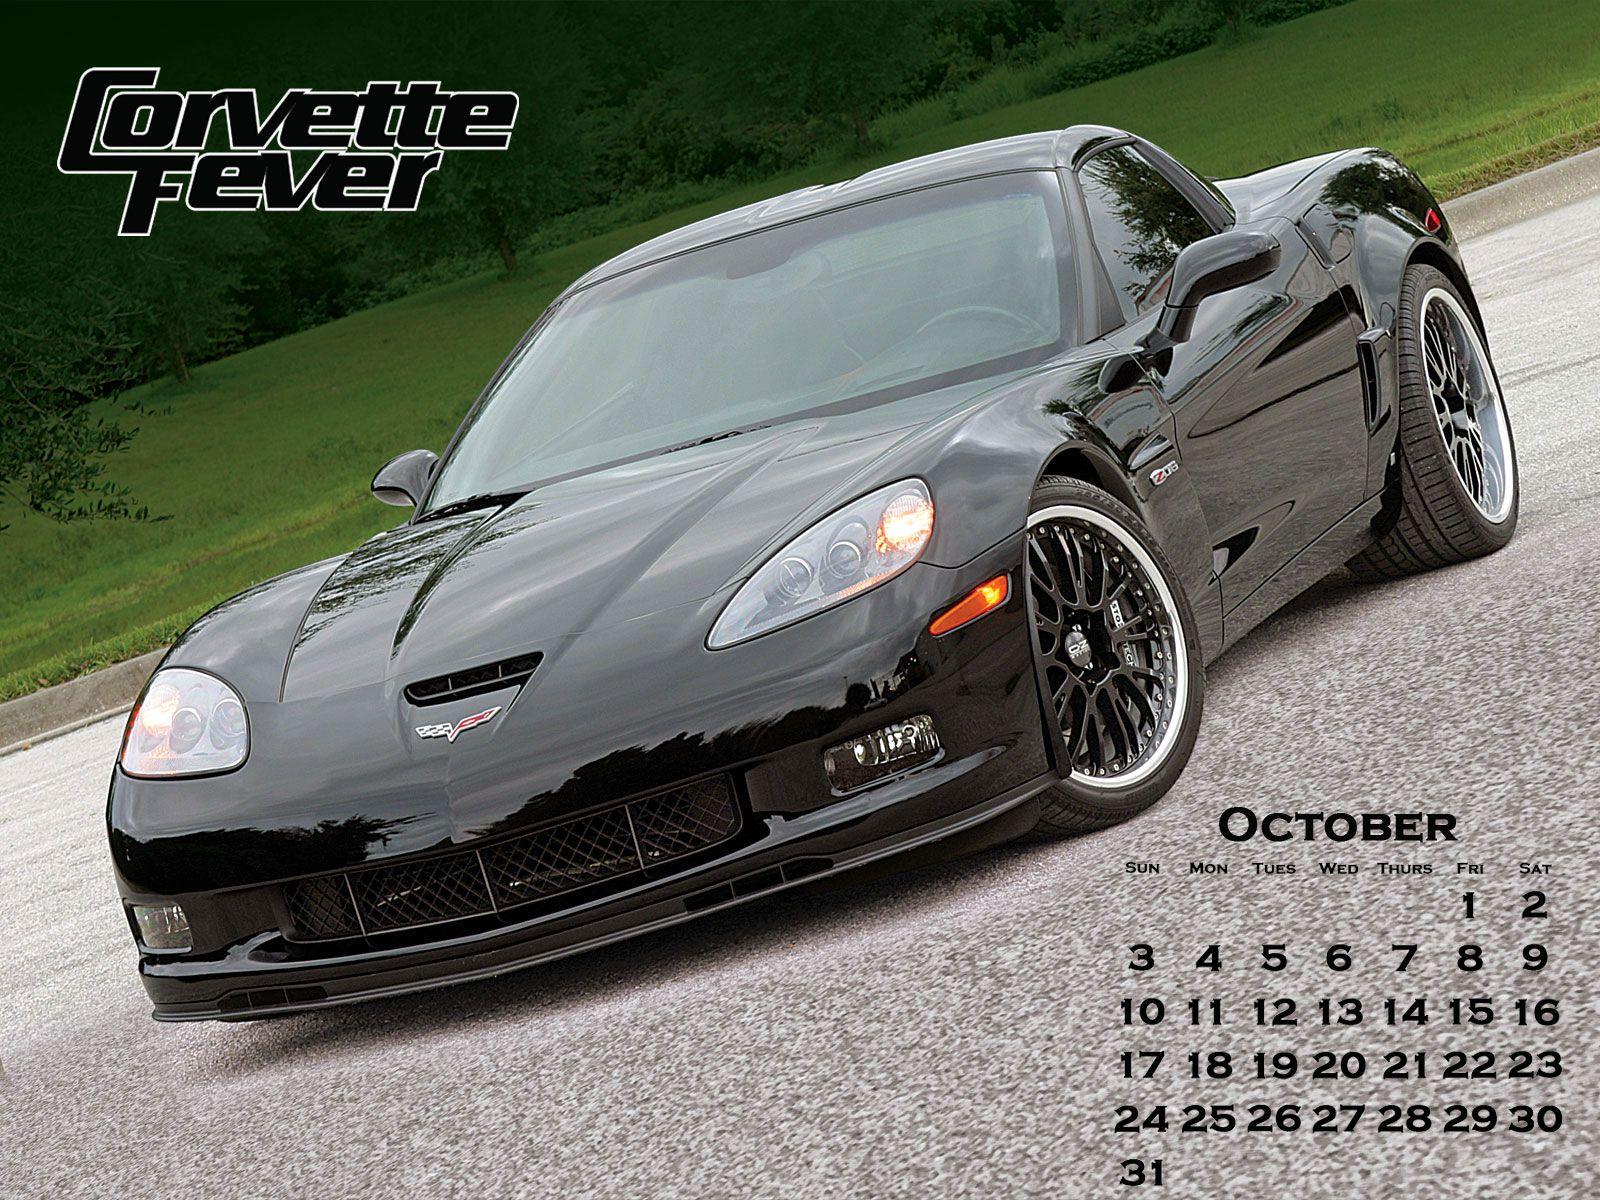 Corvette Fever Desktop Wallpapers 1600x1200